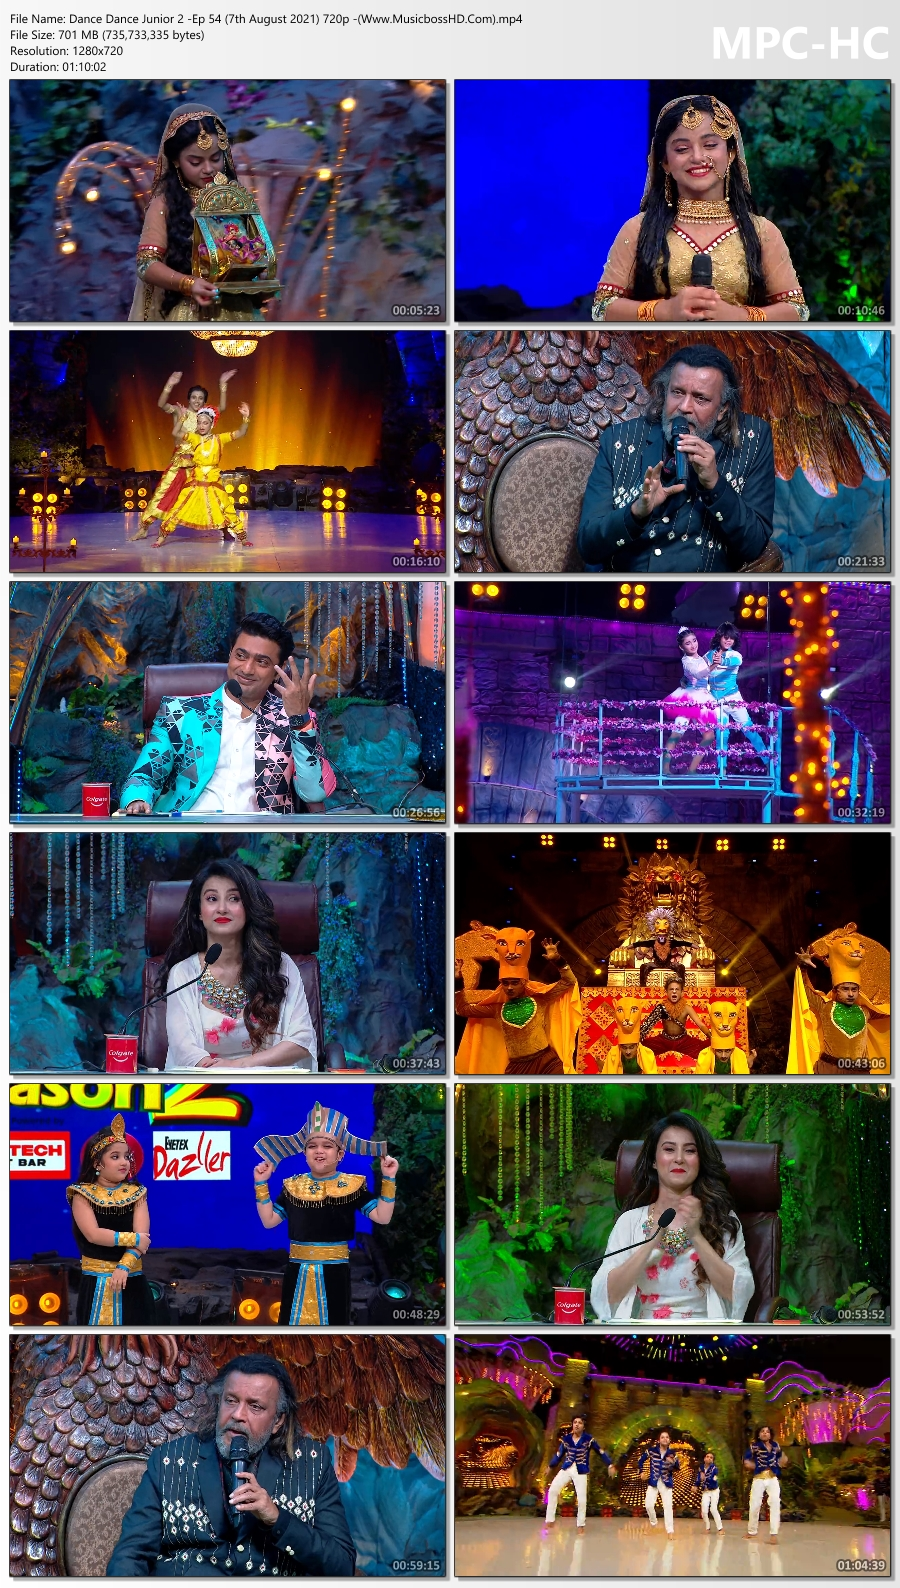 Dance-Dance-Junior-2-Ep-54-7th-August-2021-720p-Www-Musicboss-HD-Com-mp4-thumbs